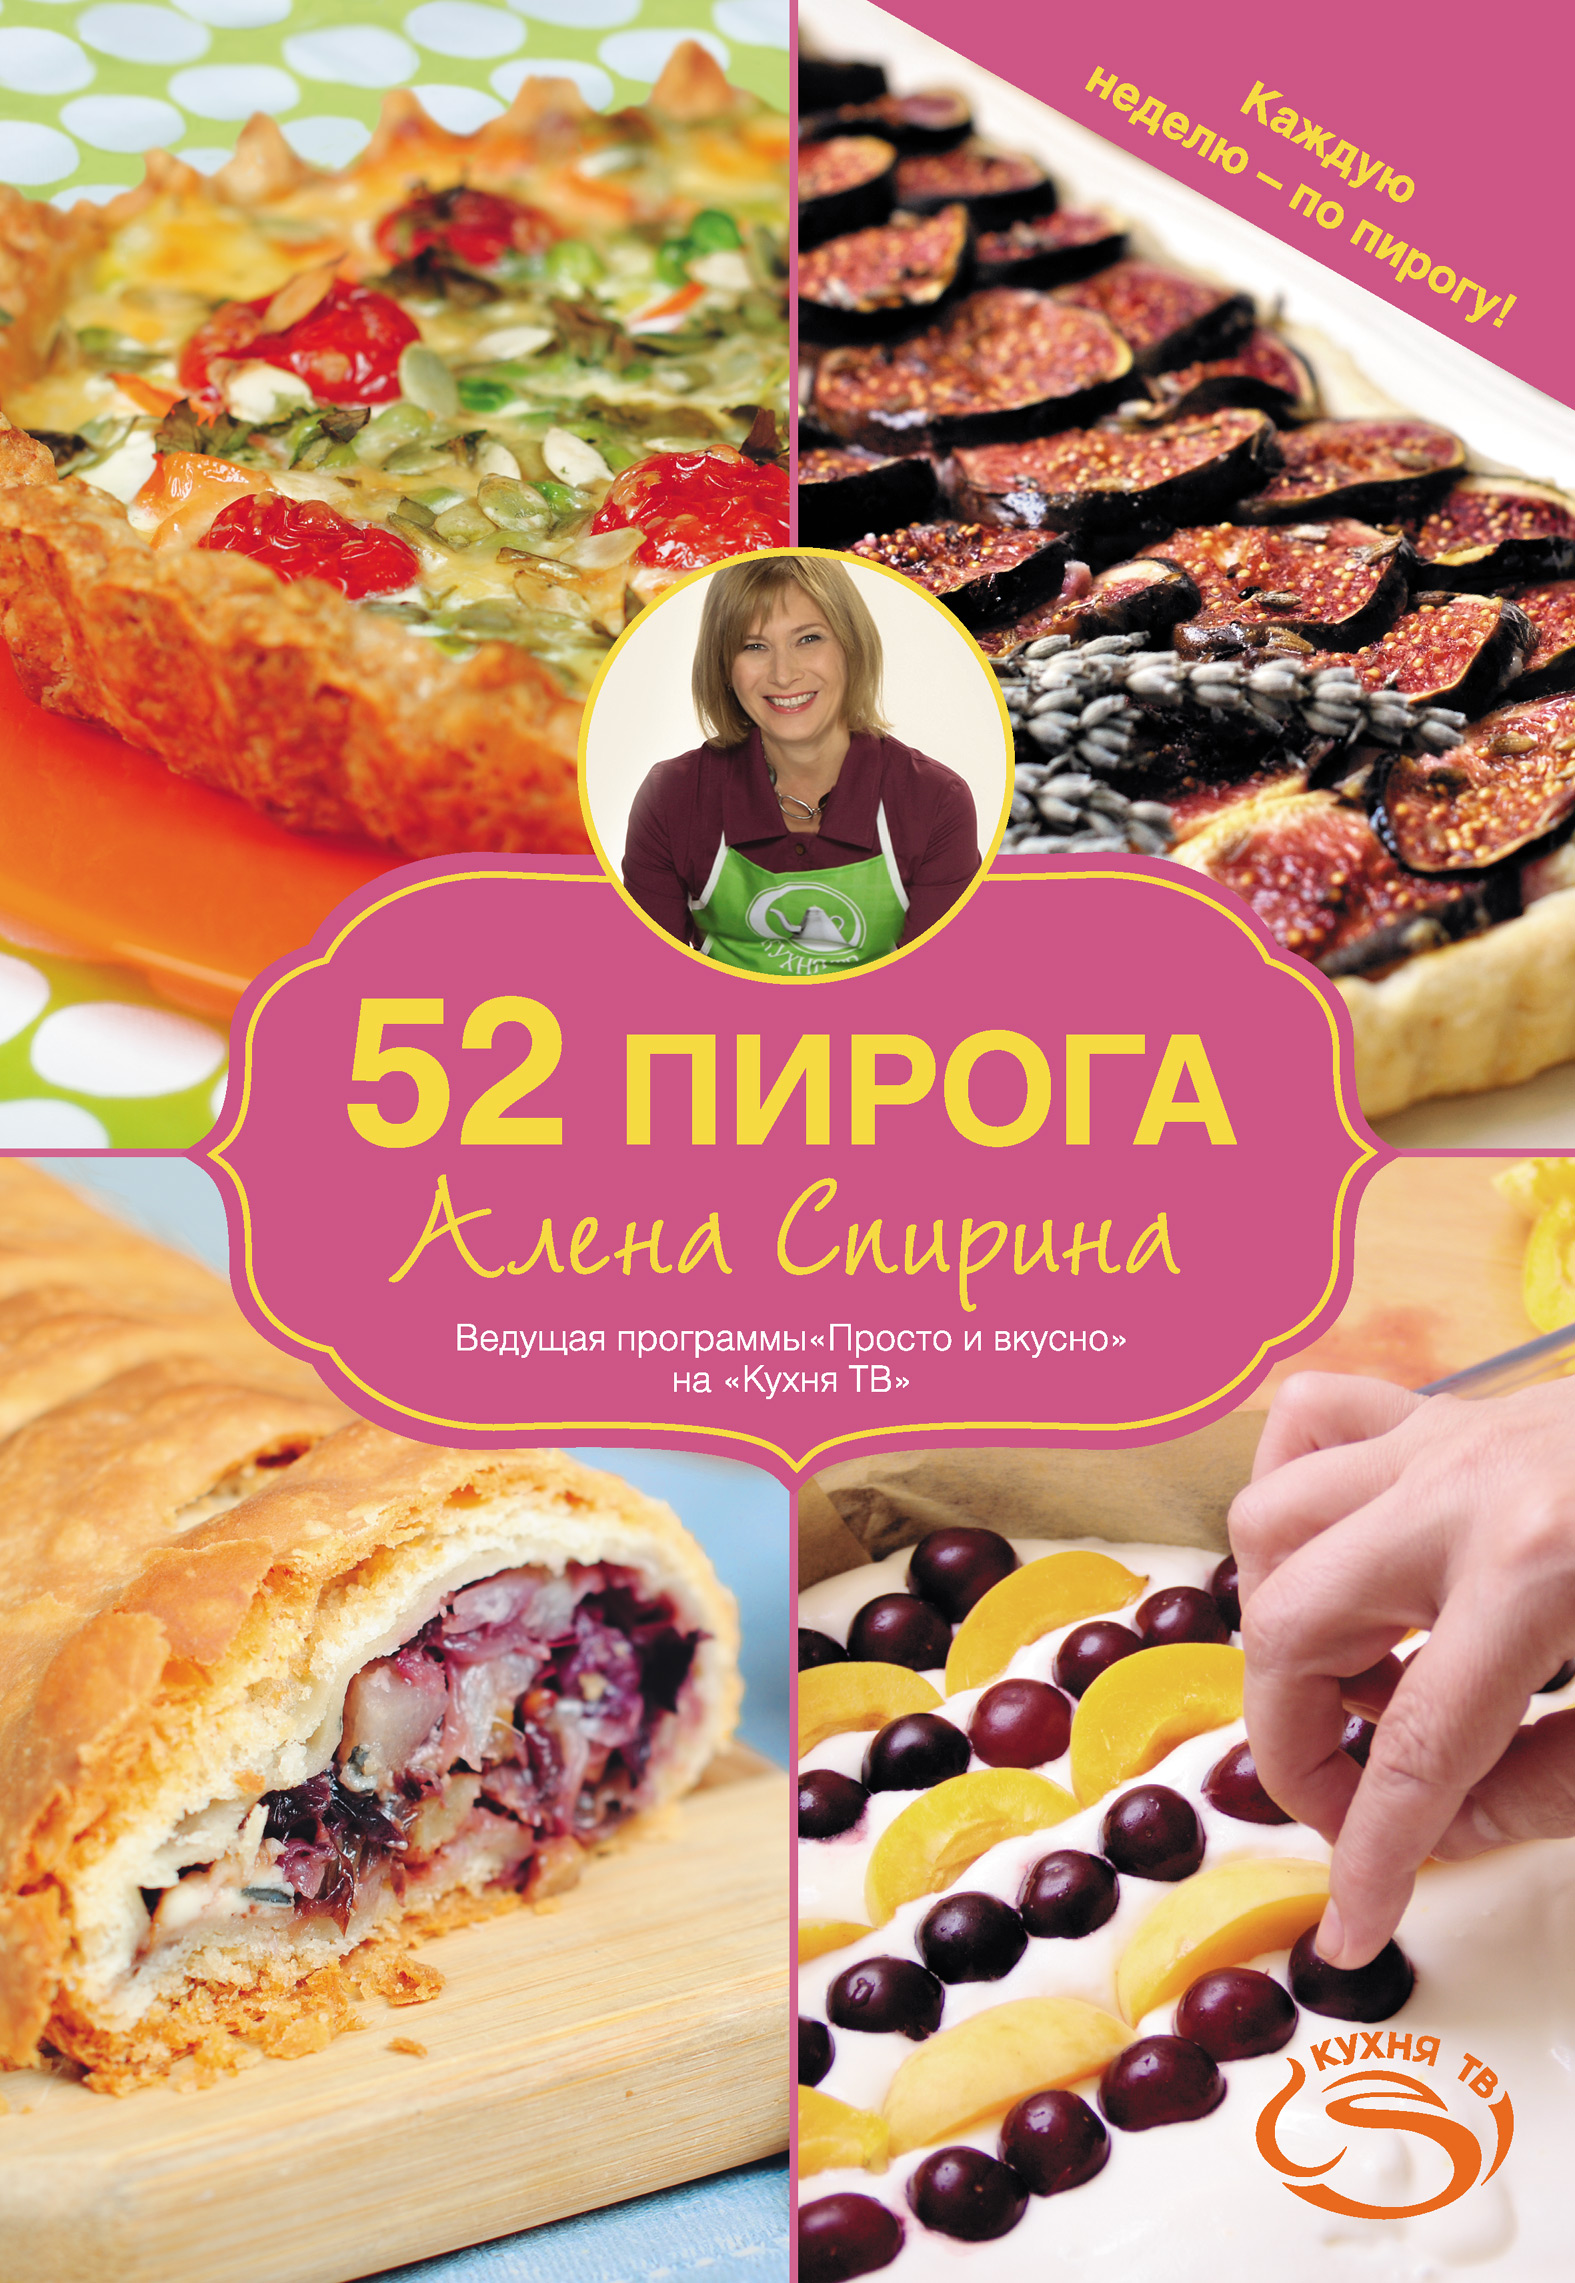 Алена Спирина 52 пирога спирина а 60 пирогов